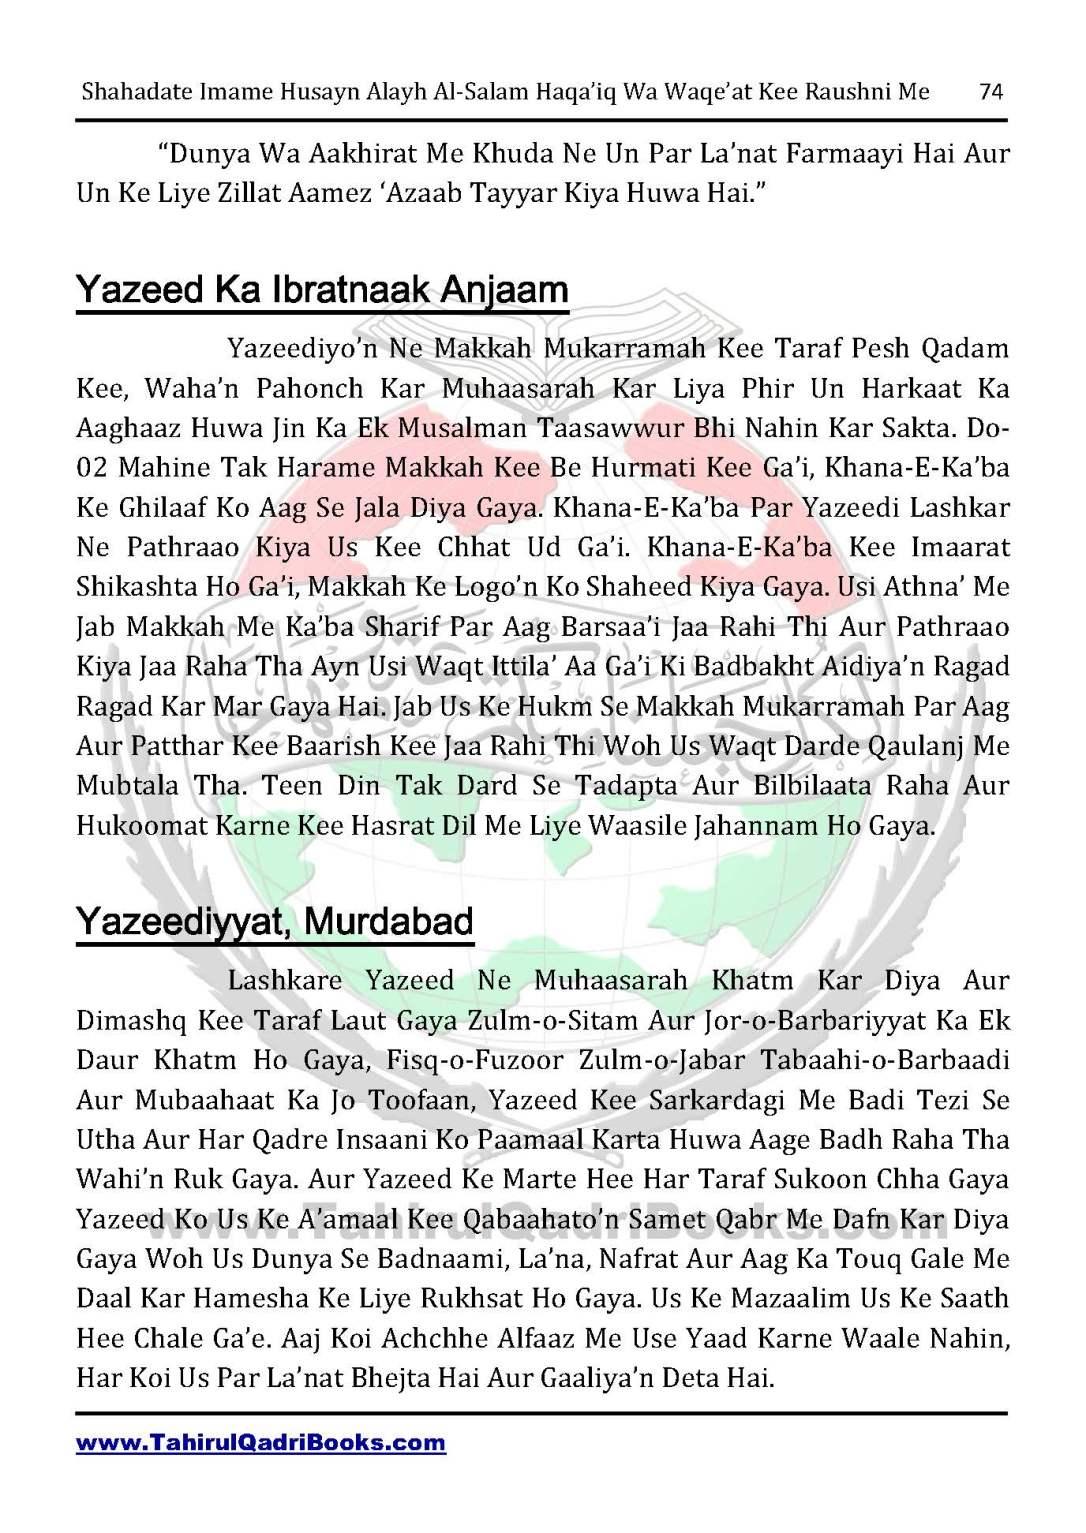 shahadate-imame-husayn-alayh-is-salam-haqaiq-wa-waqe_at-kee-raushni-me-in-roman-urdu-unlocked_Page_74